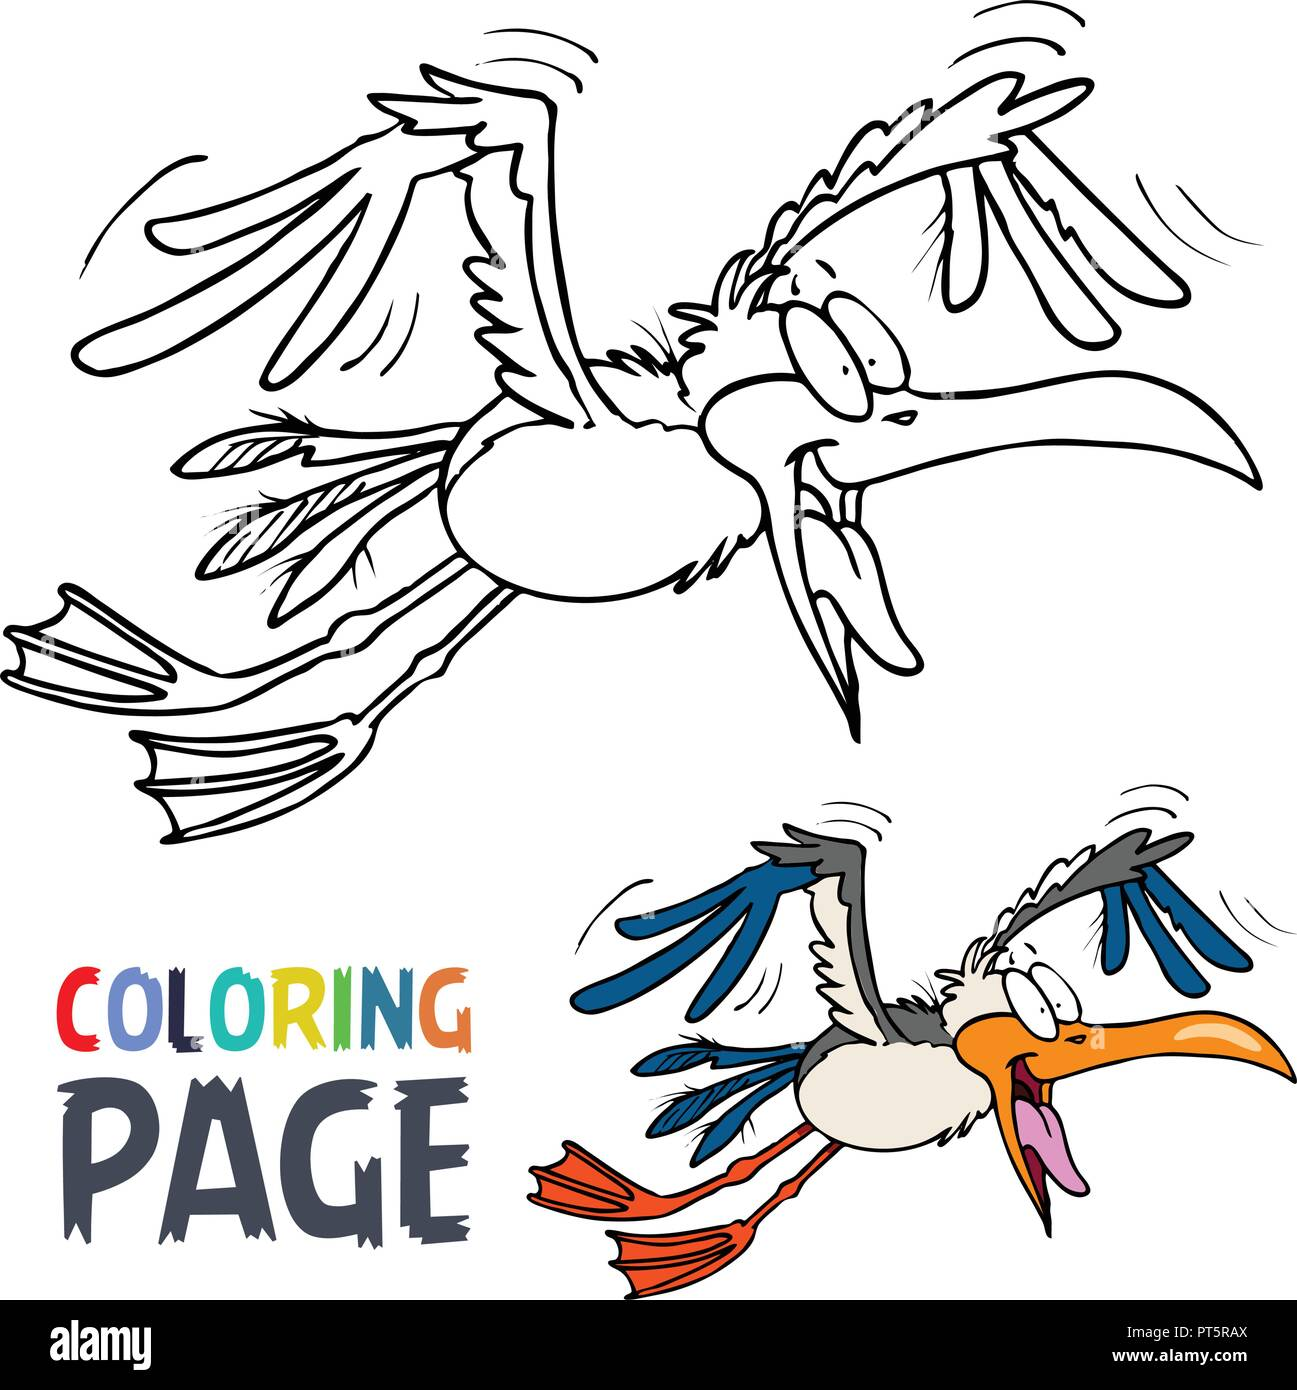 flying bird cartoon coloring page Stock Vector